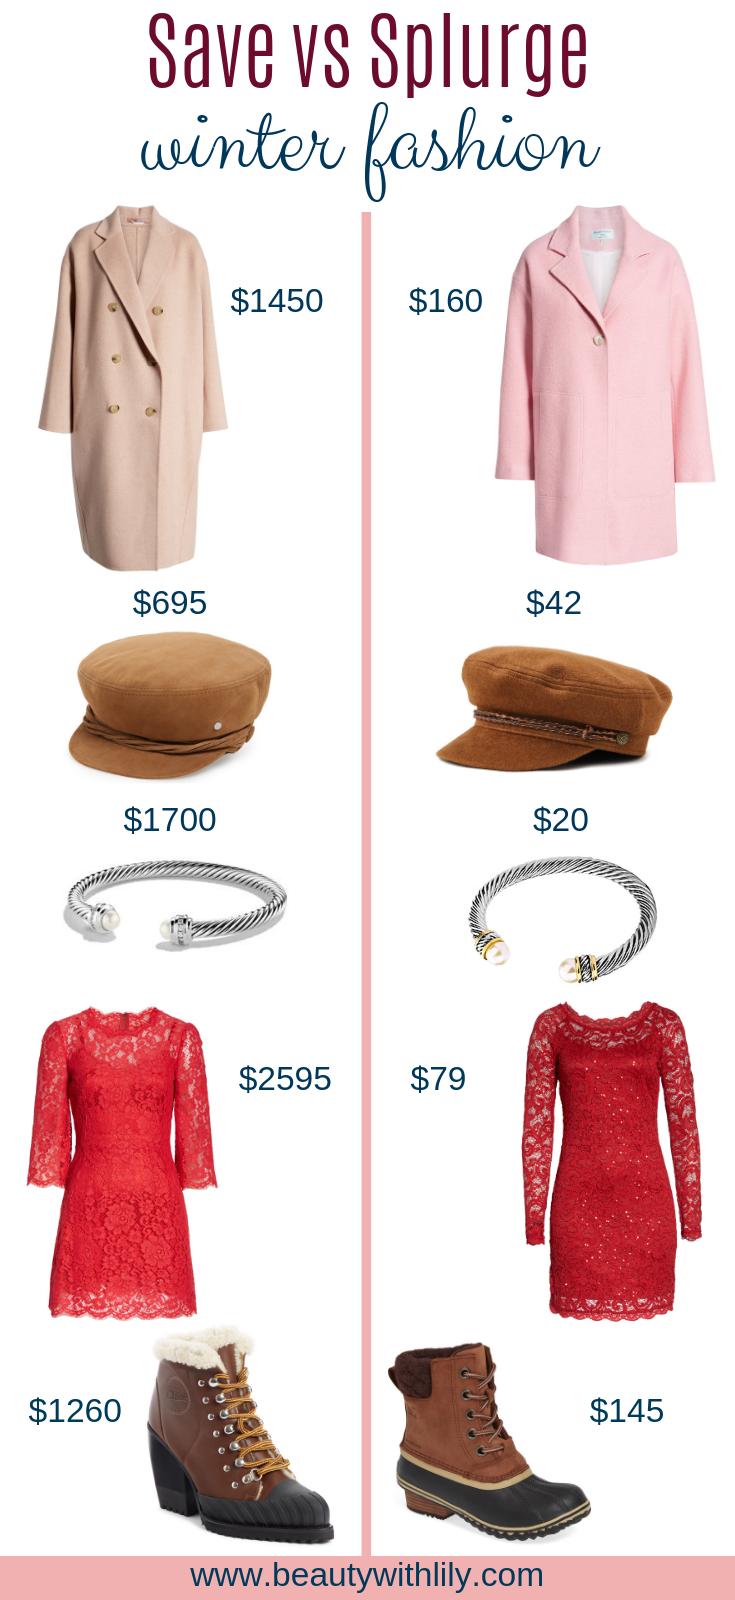 Save vs Splurge Winter Fashion // Winter Fashion // Winter Fashion Ideas // Designer Dupes // Affordable Fashion | Beauty With Lily #fashionblogger #designerdupes #affordablefashion